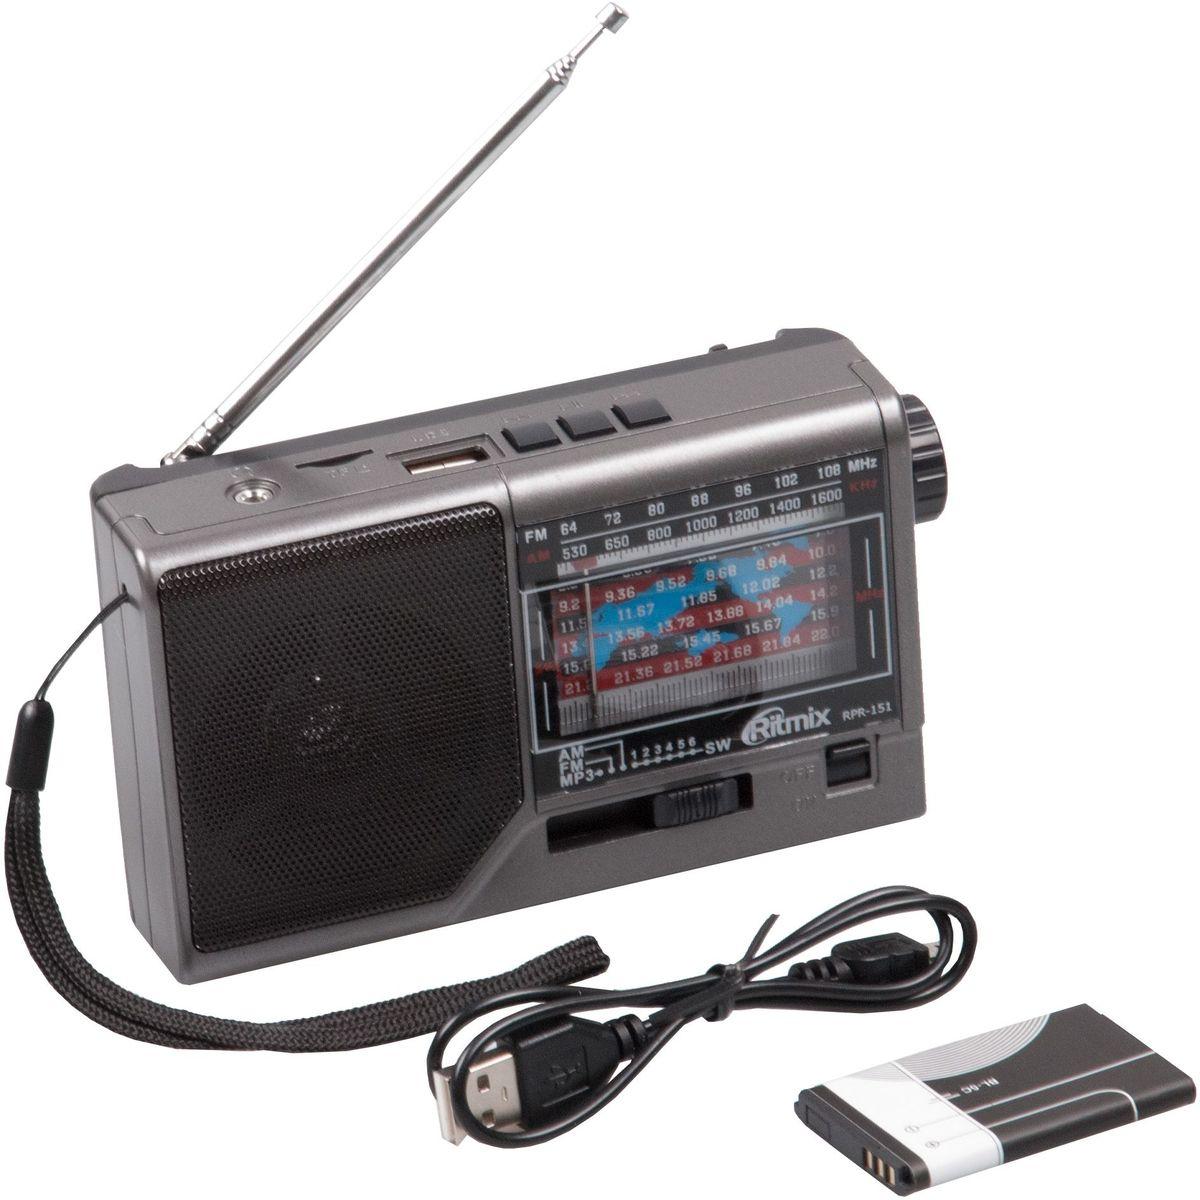 Ritmix RPR-151 радиоприемник - Магнитолы, радиоприемники